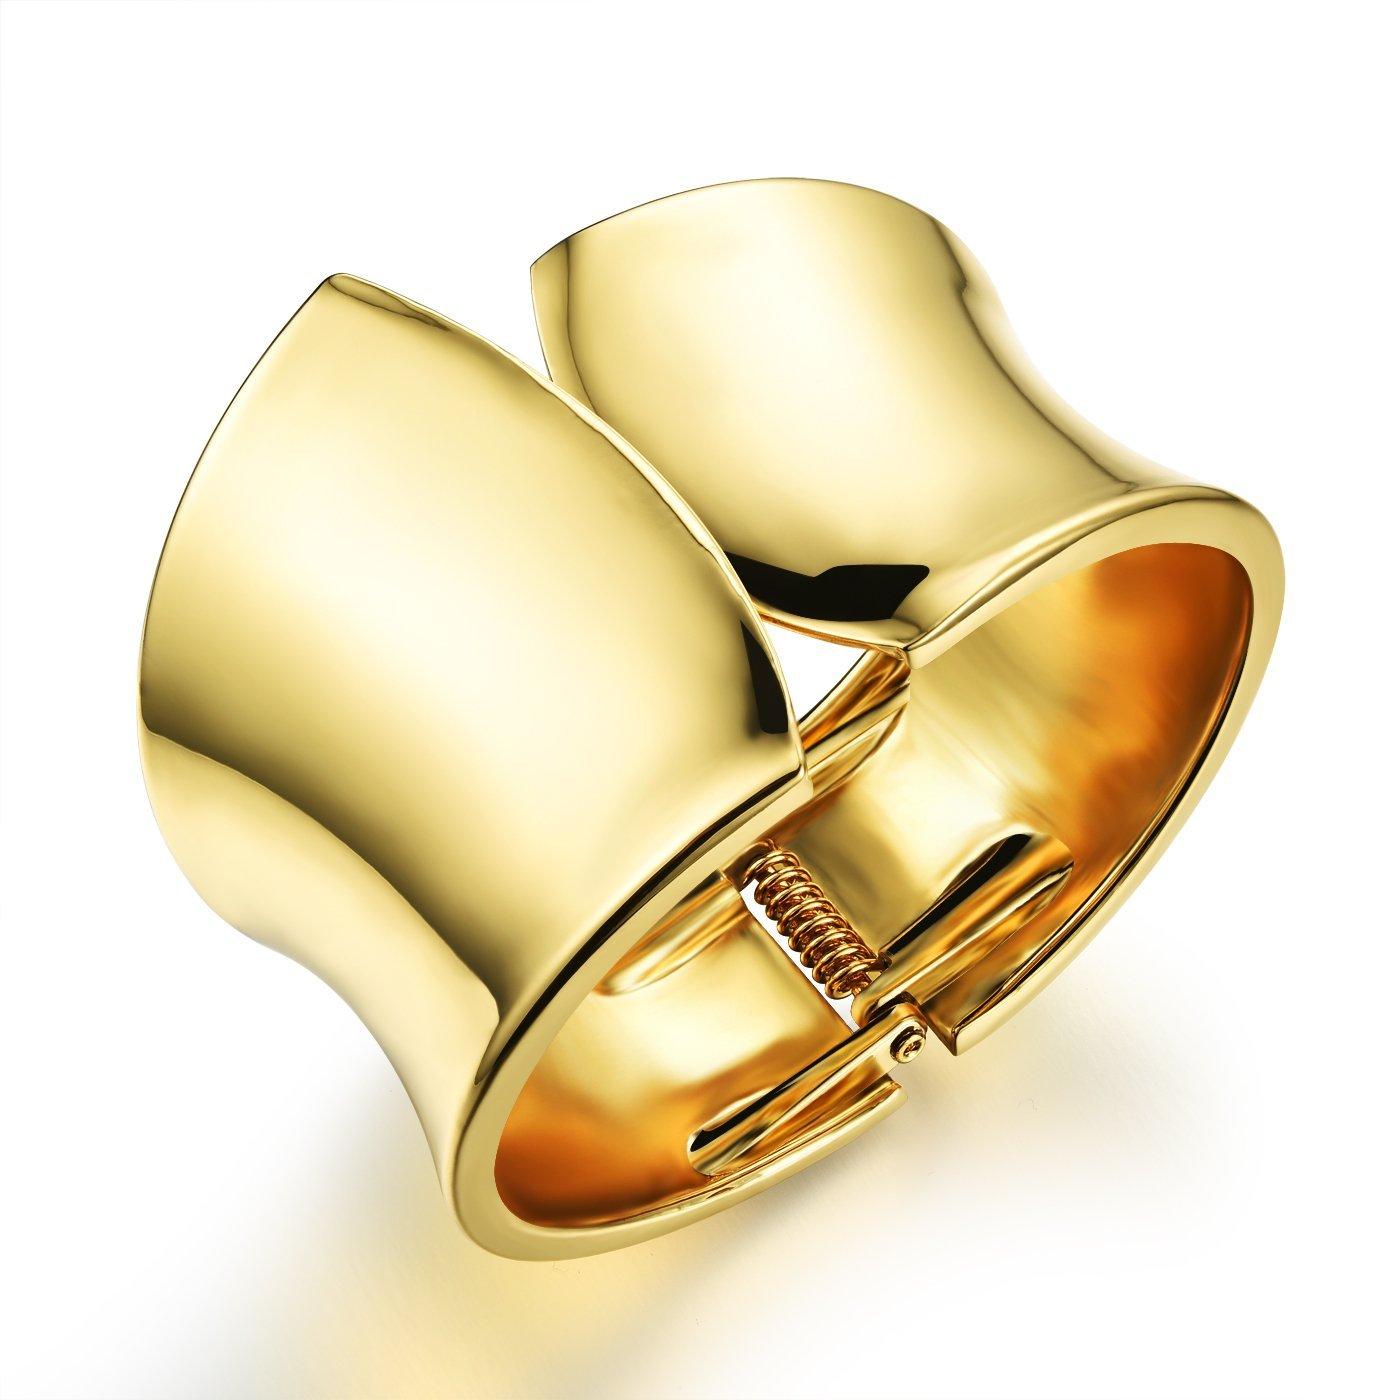 Fashion Bracelets 18K Gold Tone Smooth Wide Uncompacted Bracelet for Women L7.08''